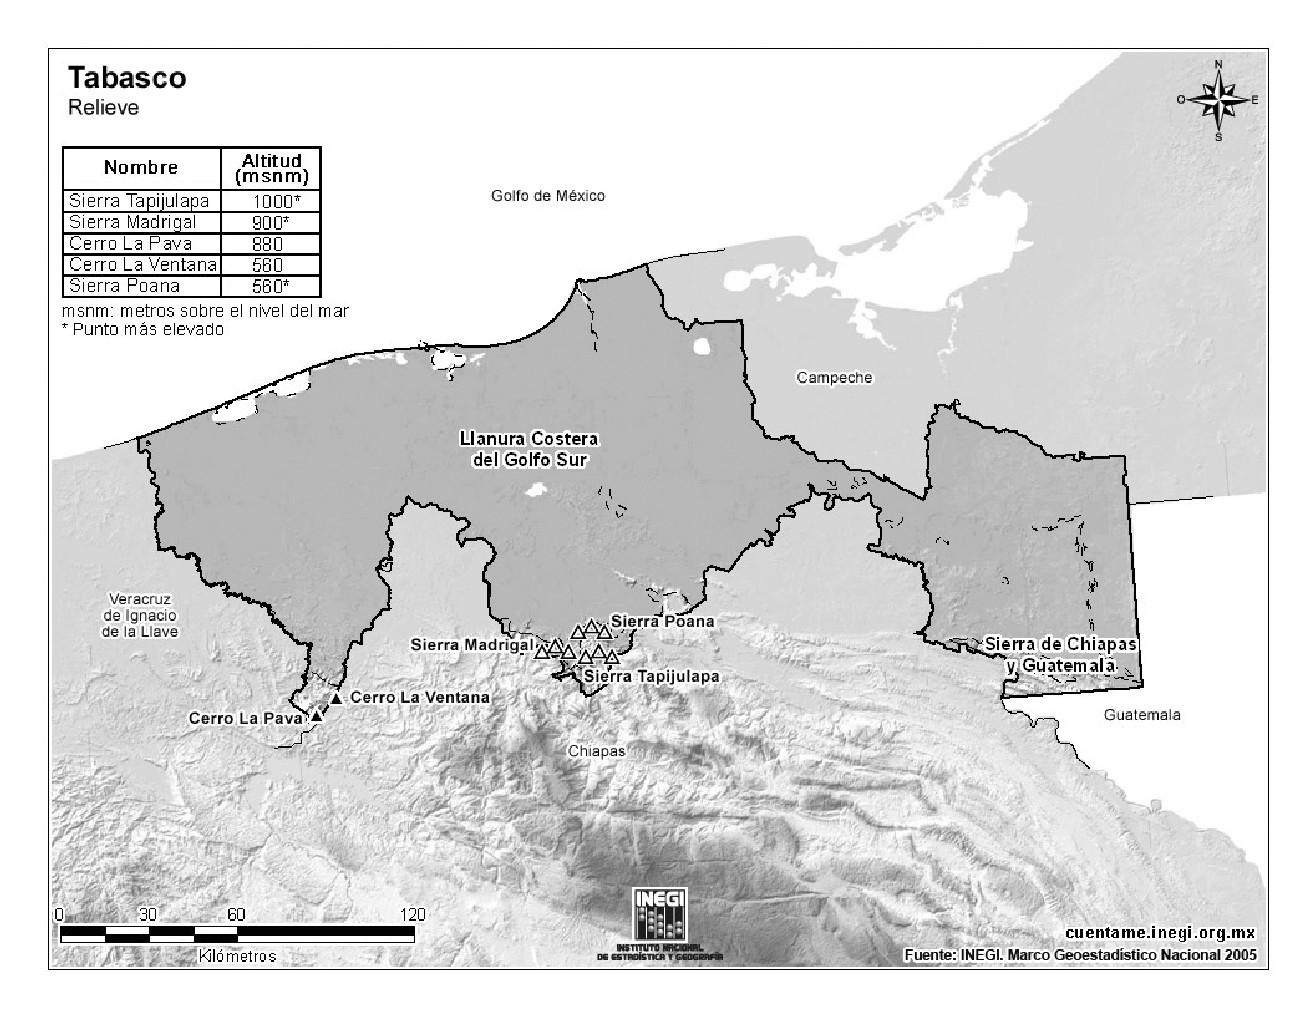 Mapa de montañas de Tabasco. INEGI de México